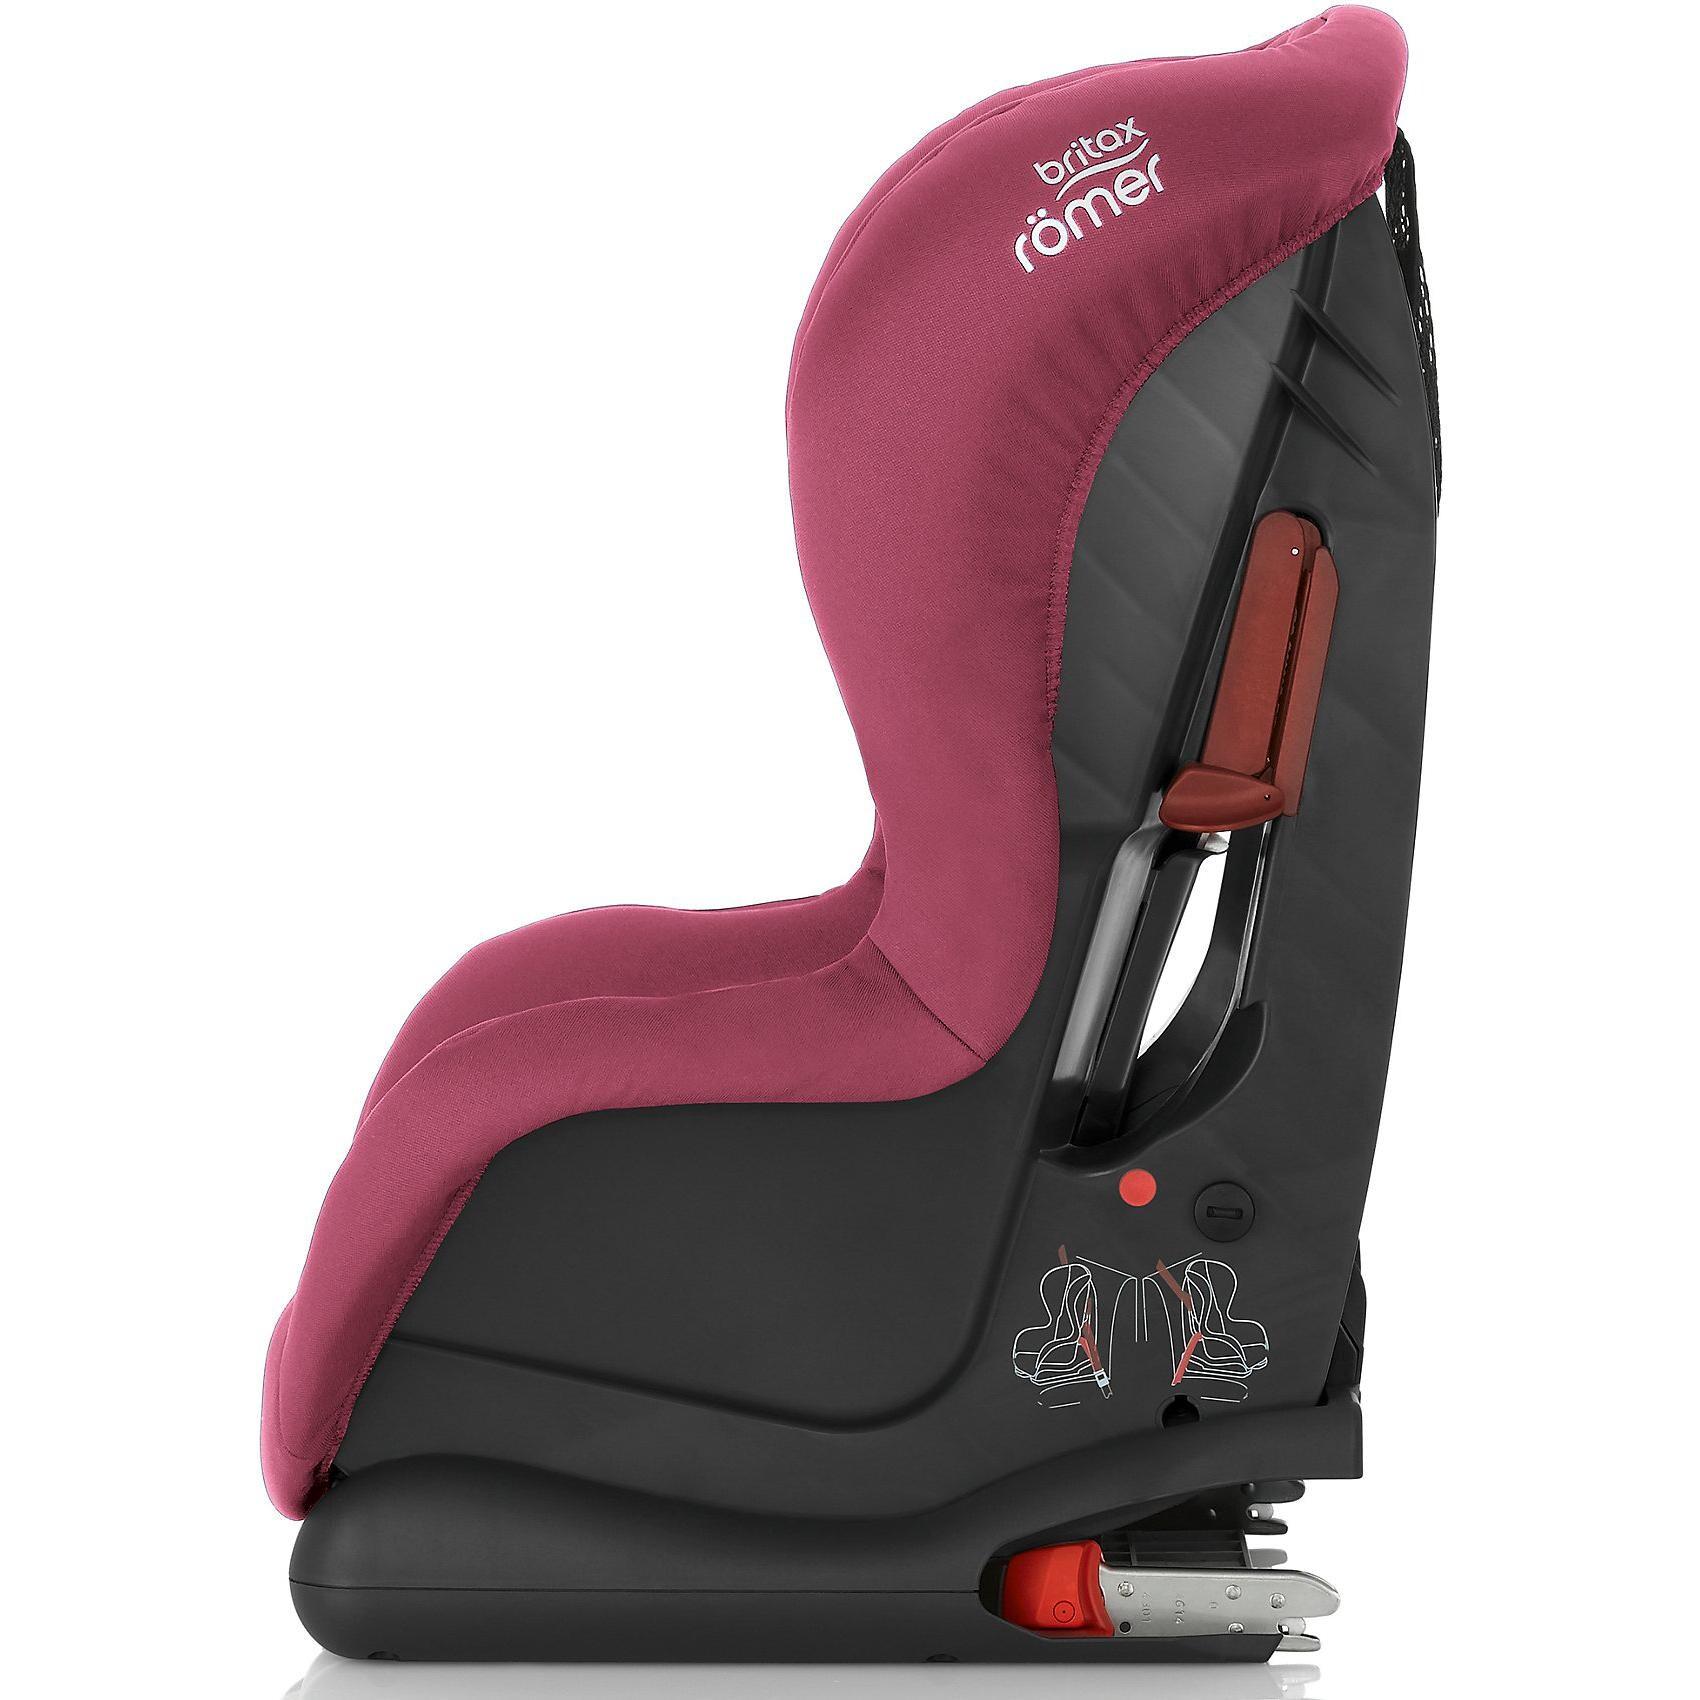 Britax Römer Auto-Kindersitz Duo Plus Wine Rose 2018